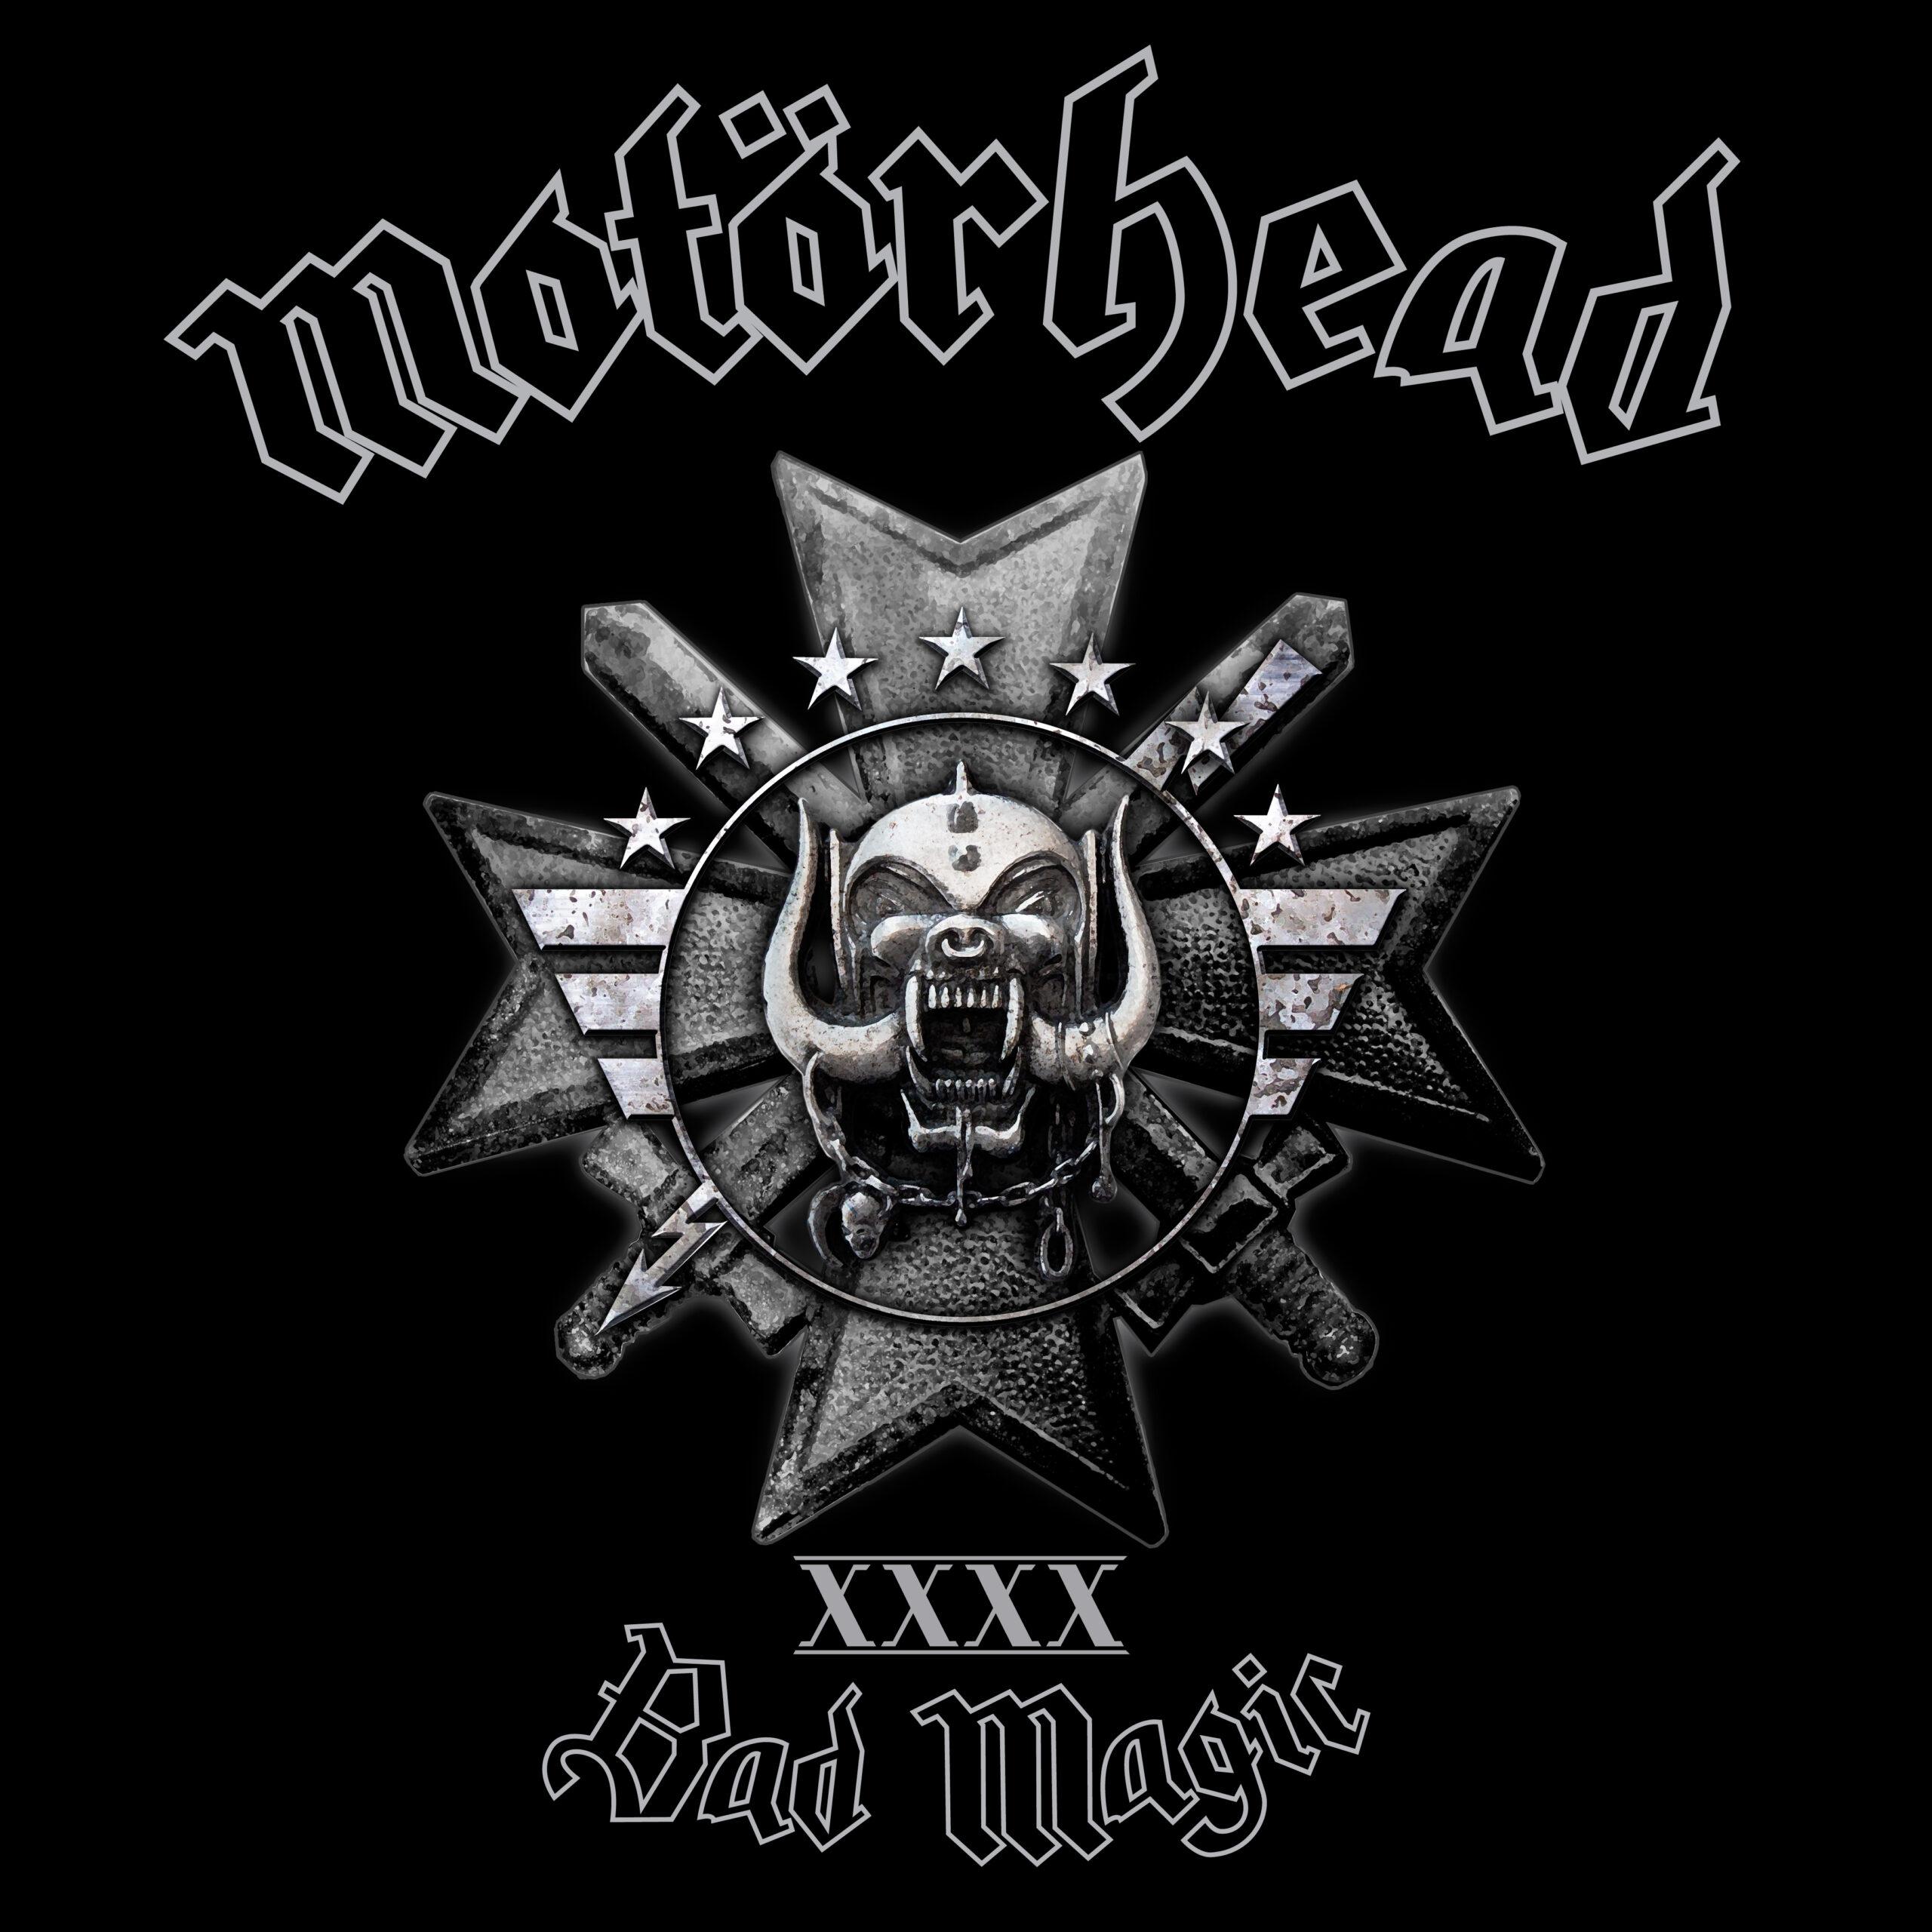 Motorhead_Bad Magic